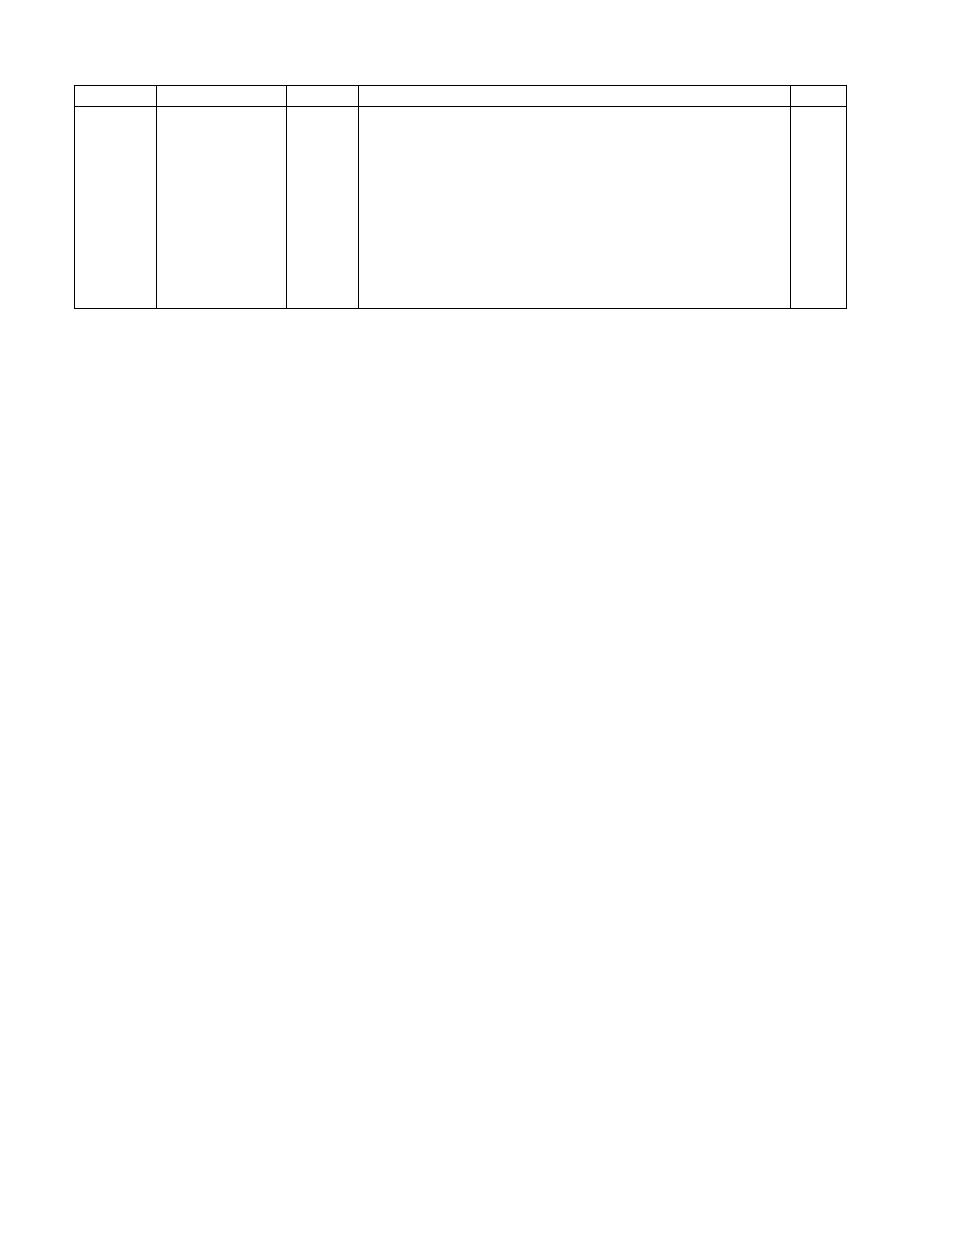 medium resolution of wiring diagram for jlg 2630es wiring diagramwiring diagram for jlg 2630es wiring diagramjlg 2033e wiring diagram